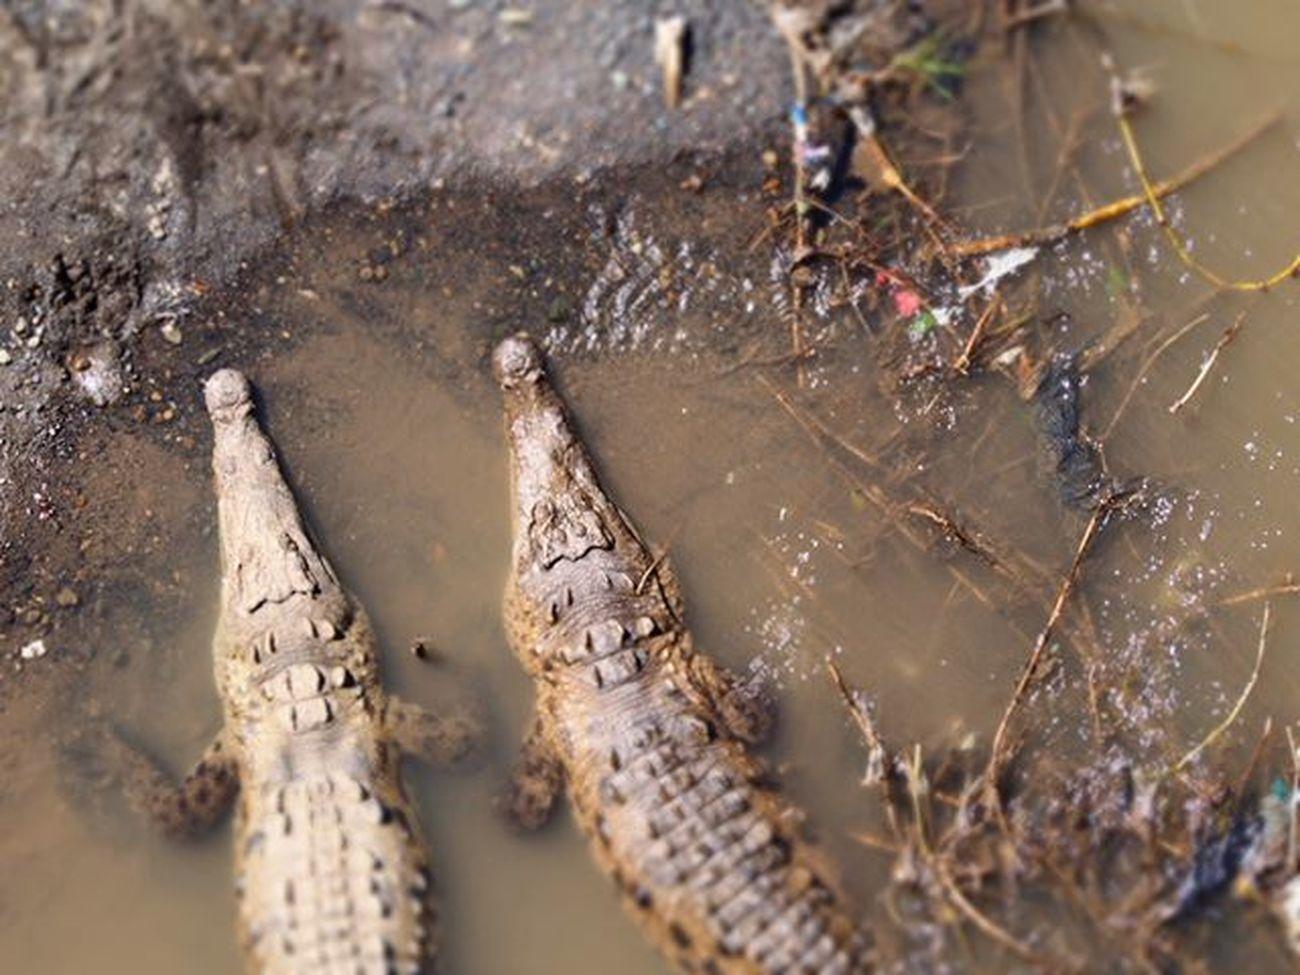 Crocodiles in a river we passed over heading to Manuel Antonio, Costa Rica ---------------------------------------- Manuelantonio Exploremanuelantonio Costarica Explorecosta Crocodile Croc Bigcroc Crocs Nature Naturelovers Naturephotography Wanderlust Travel Travels Travelling Instatravel Wanderlust Gadventurestour Gadventures Peasinapod Olympus Wildlife Wild Reptiles Reptilesofinstagram